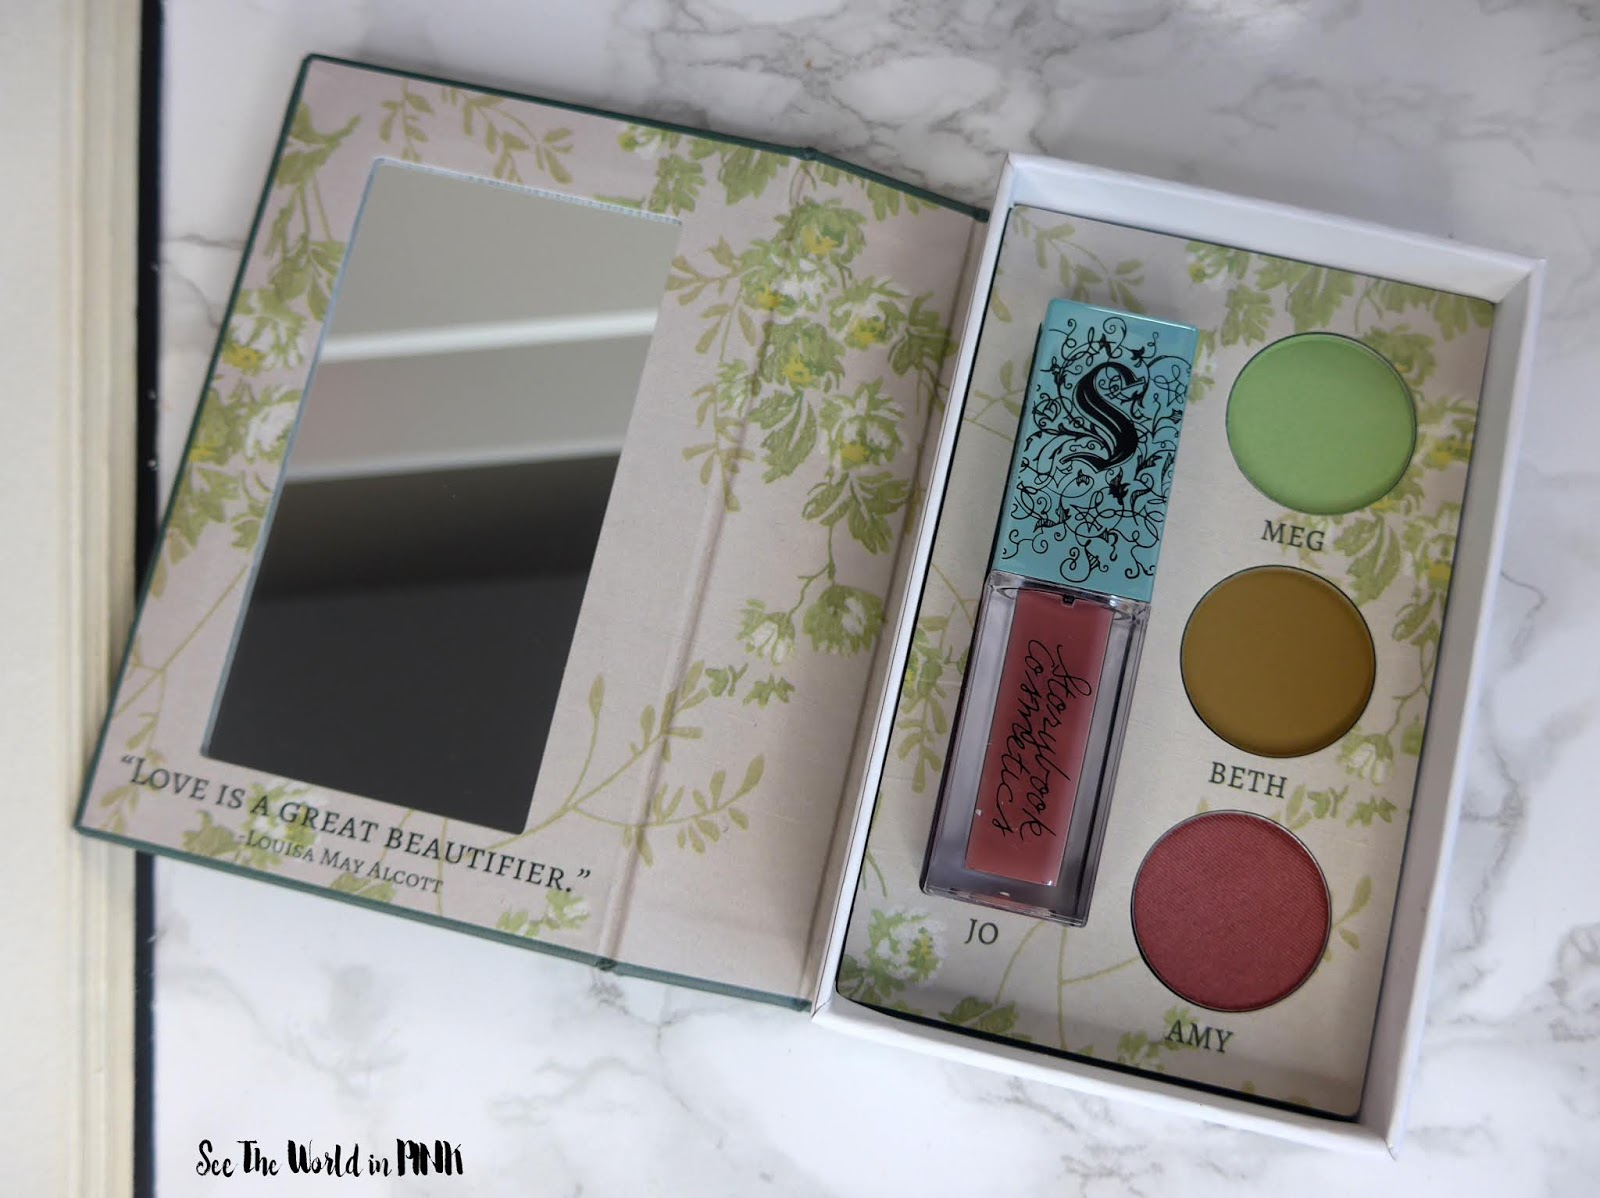 Storybook Cosmetics Book Club Subscription Box